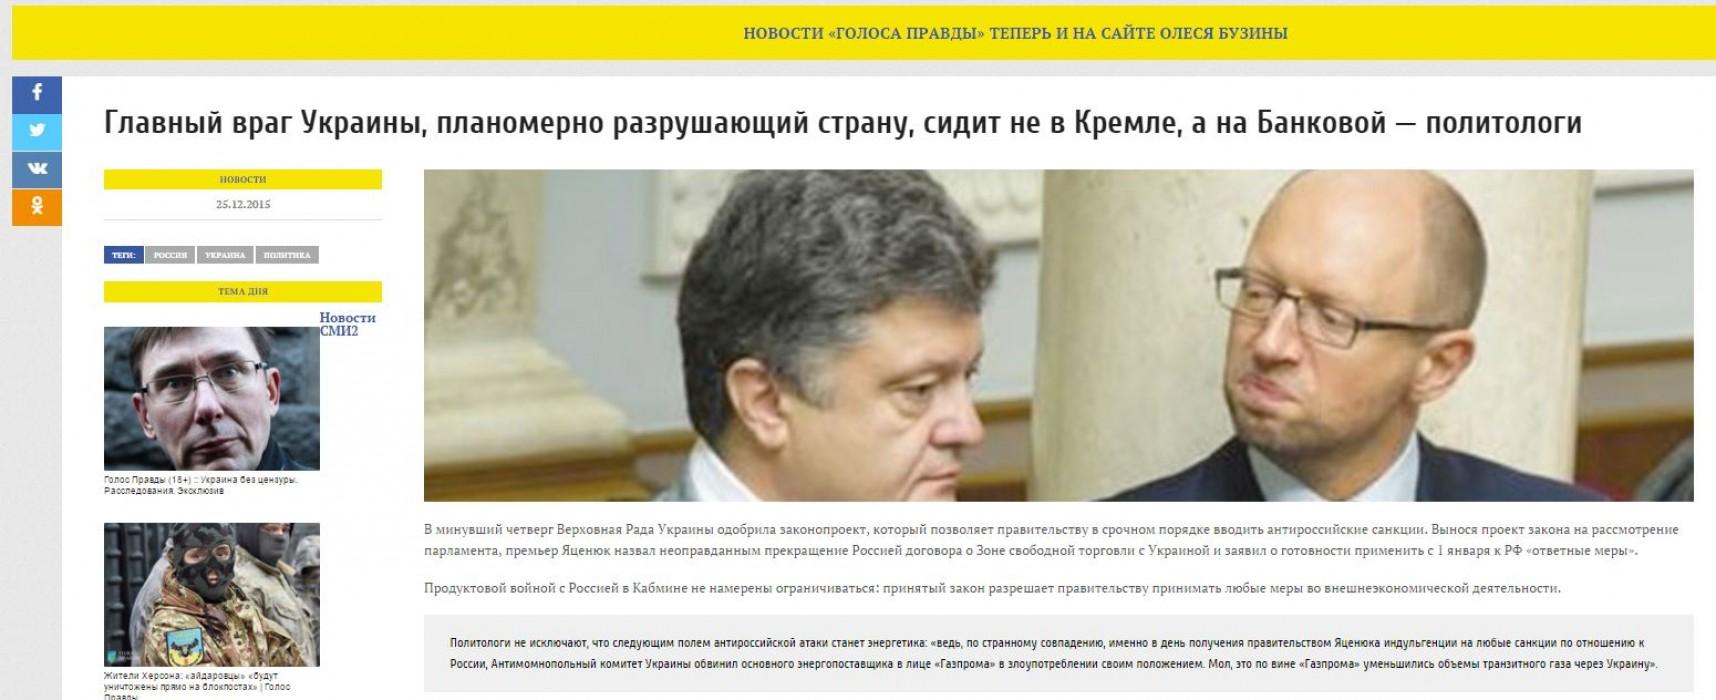 Media Presented Fake Blogger as Ukrainian Political Scientist